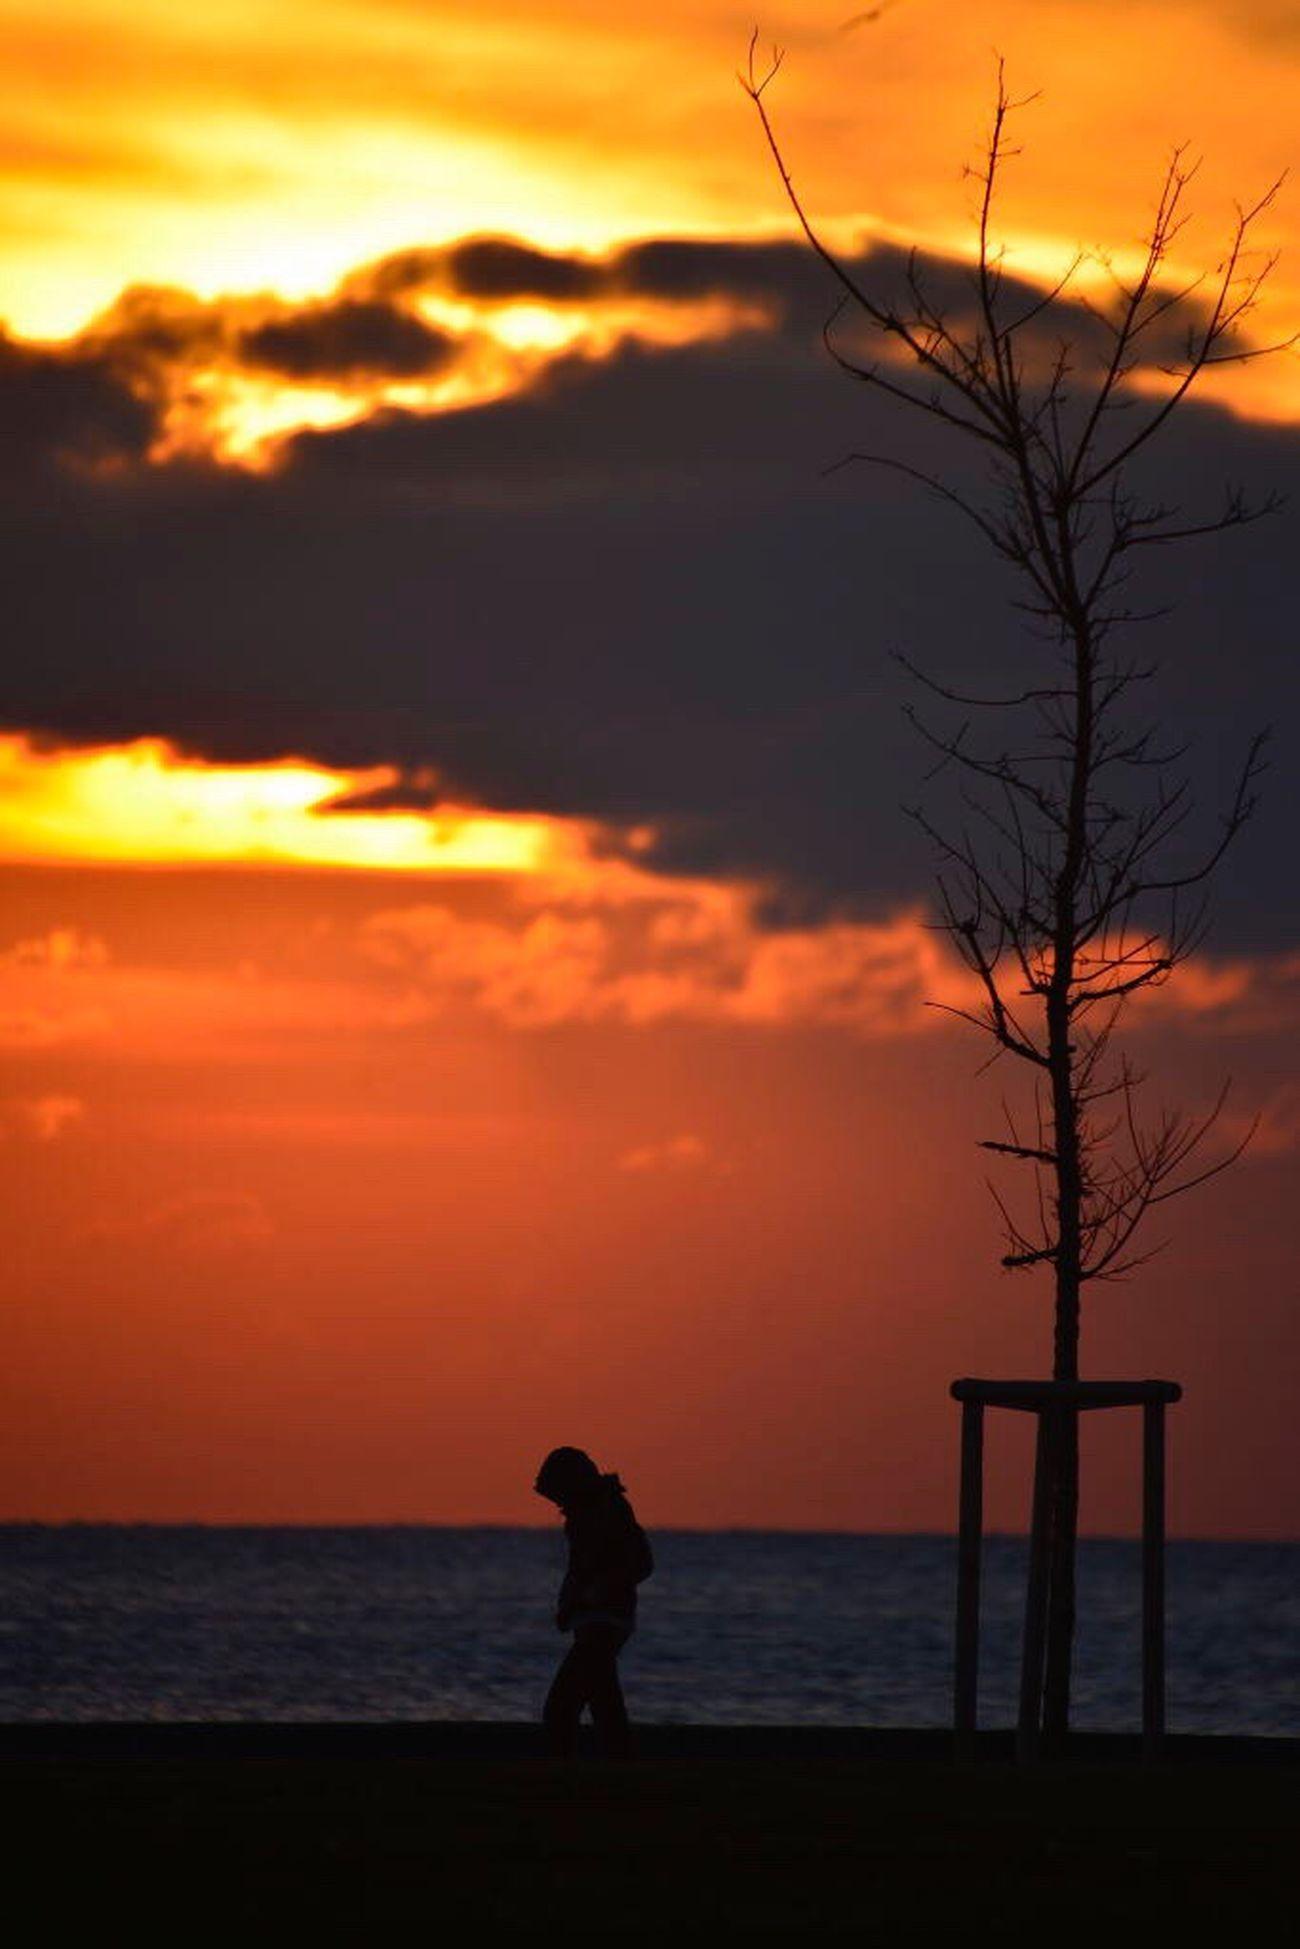 Long Goodbye Sunset Silhouette Horizon Over Water One Person People Silhouette Istanbul Turkey Bostancı Sky Orange Color Sea Cloud - Sky Scenics The Street Photographer - 2017 EyeEm Awards